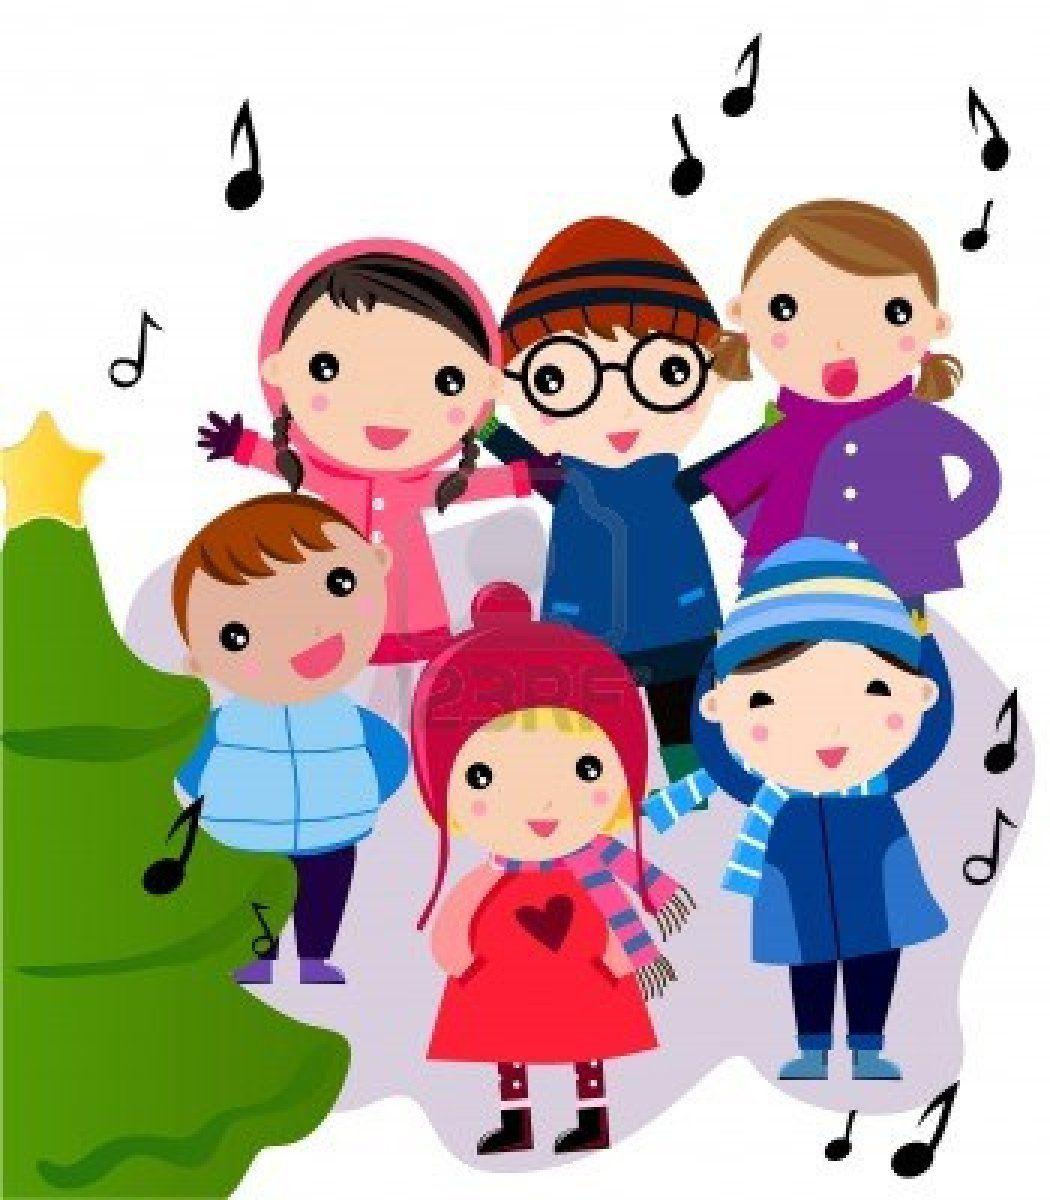 Caroling clipart winter. Christmas carols